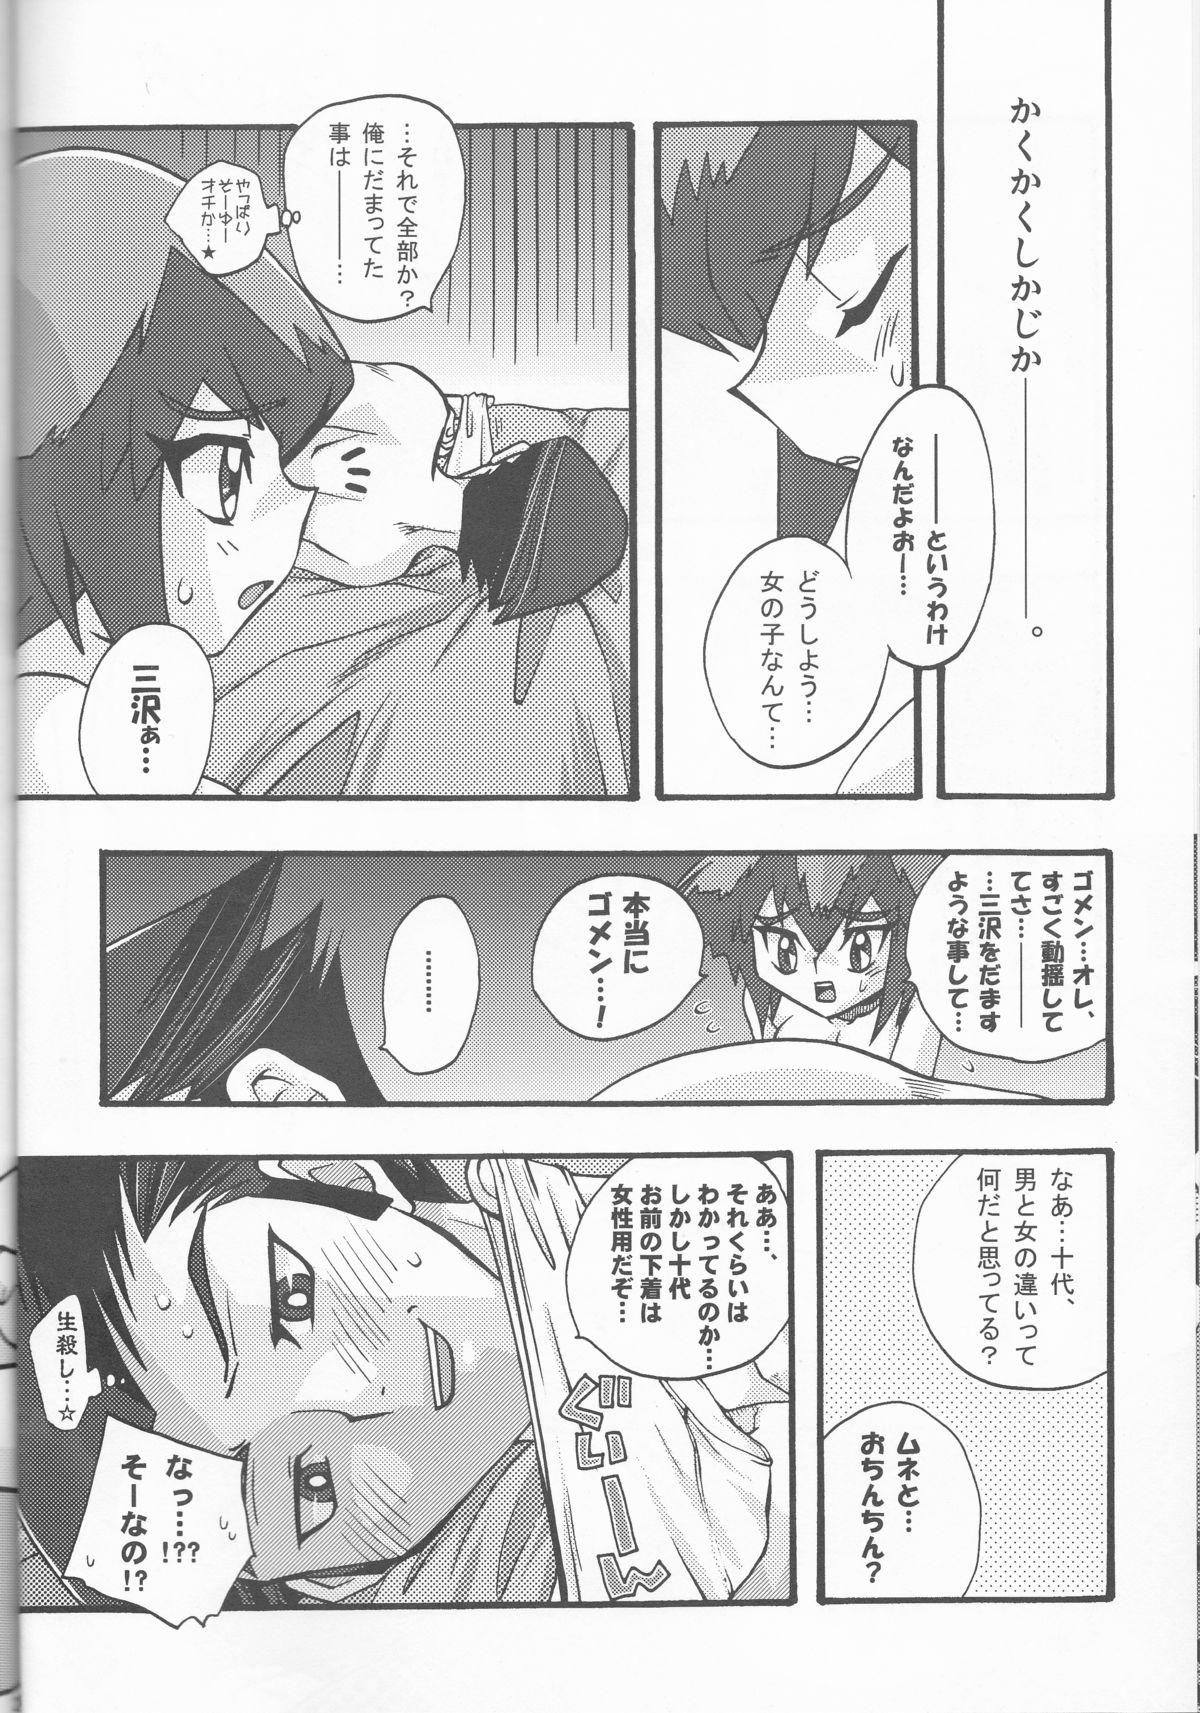 Akuma no Kuchiduke Devil's Kiss 25